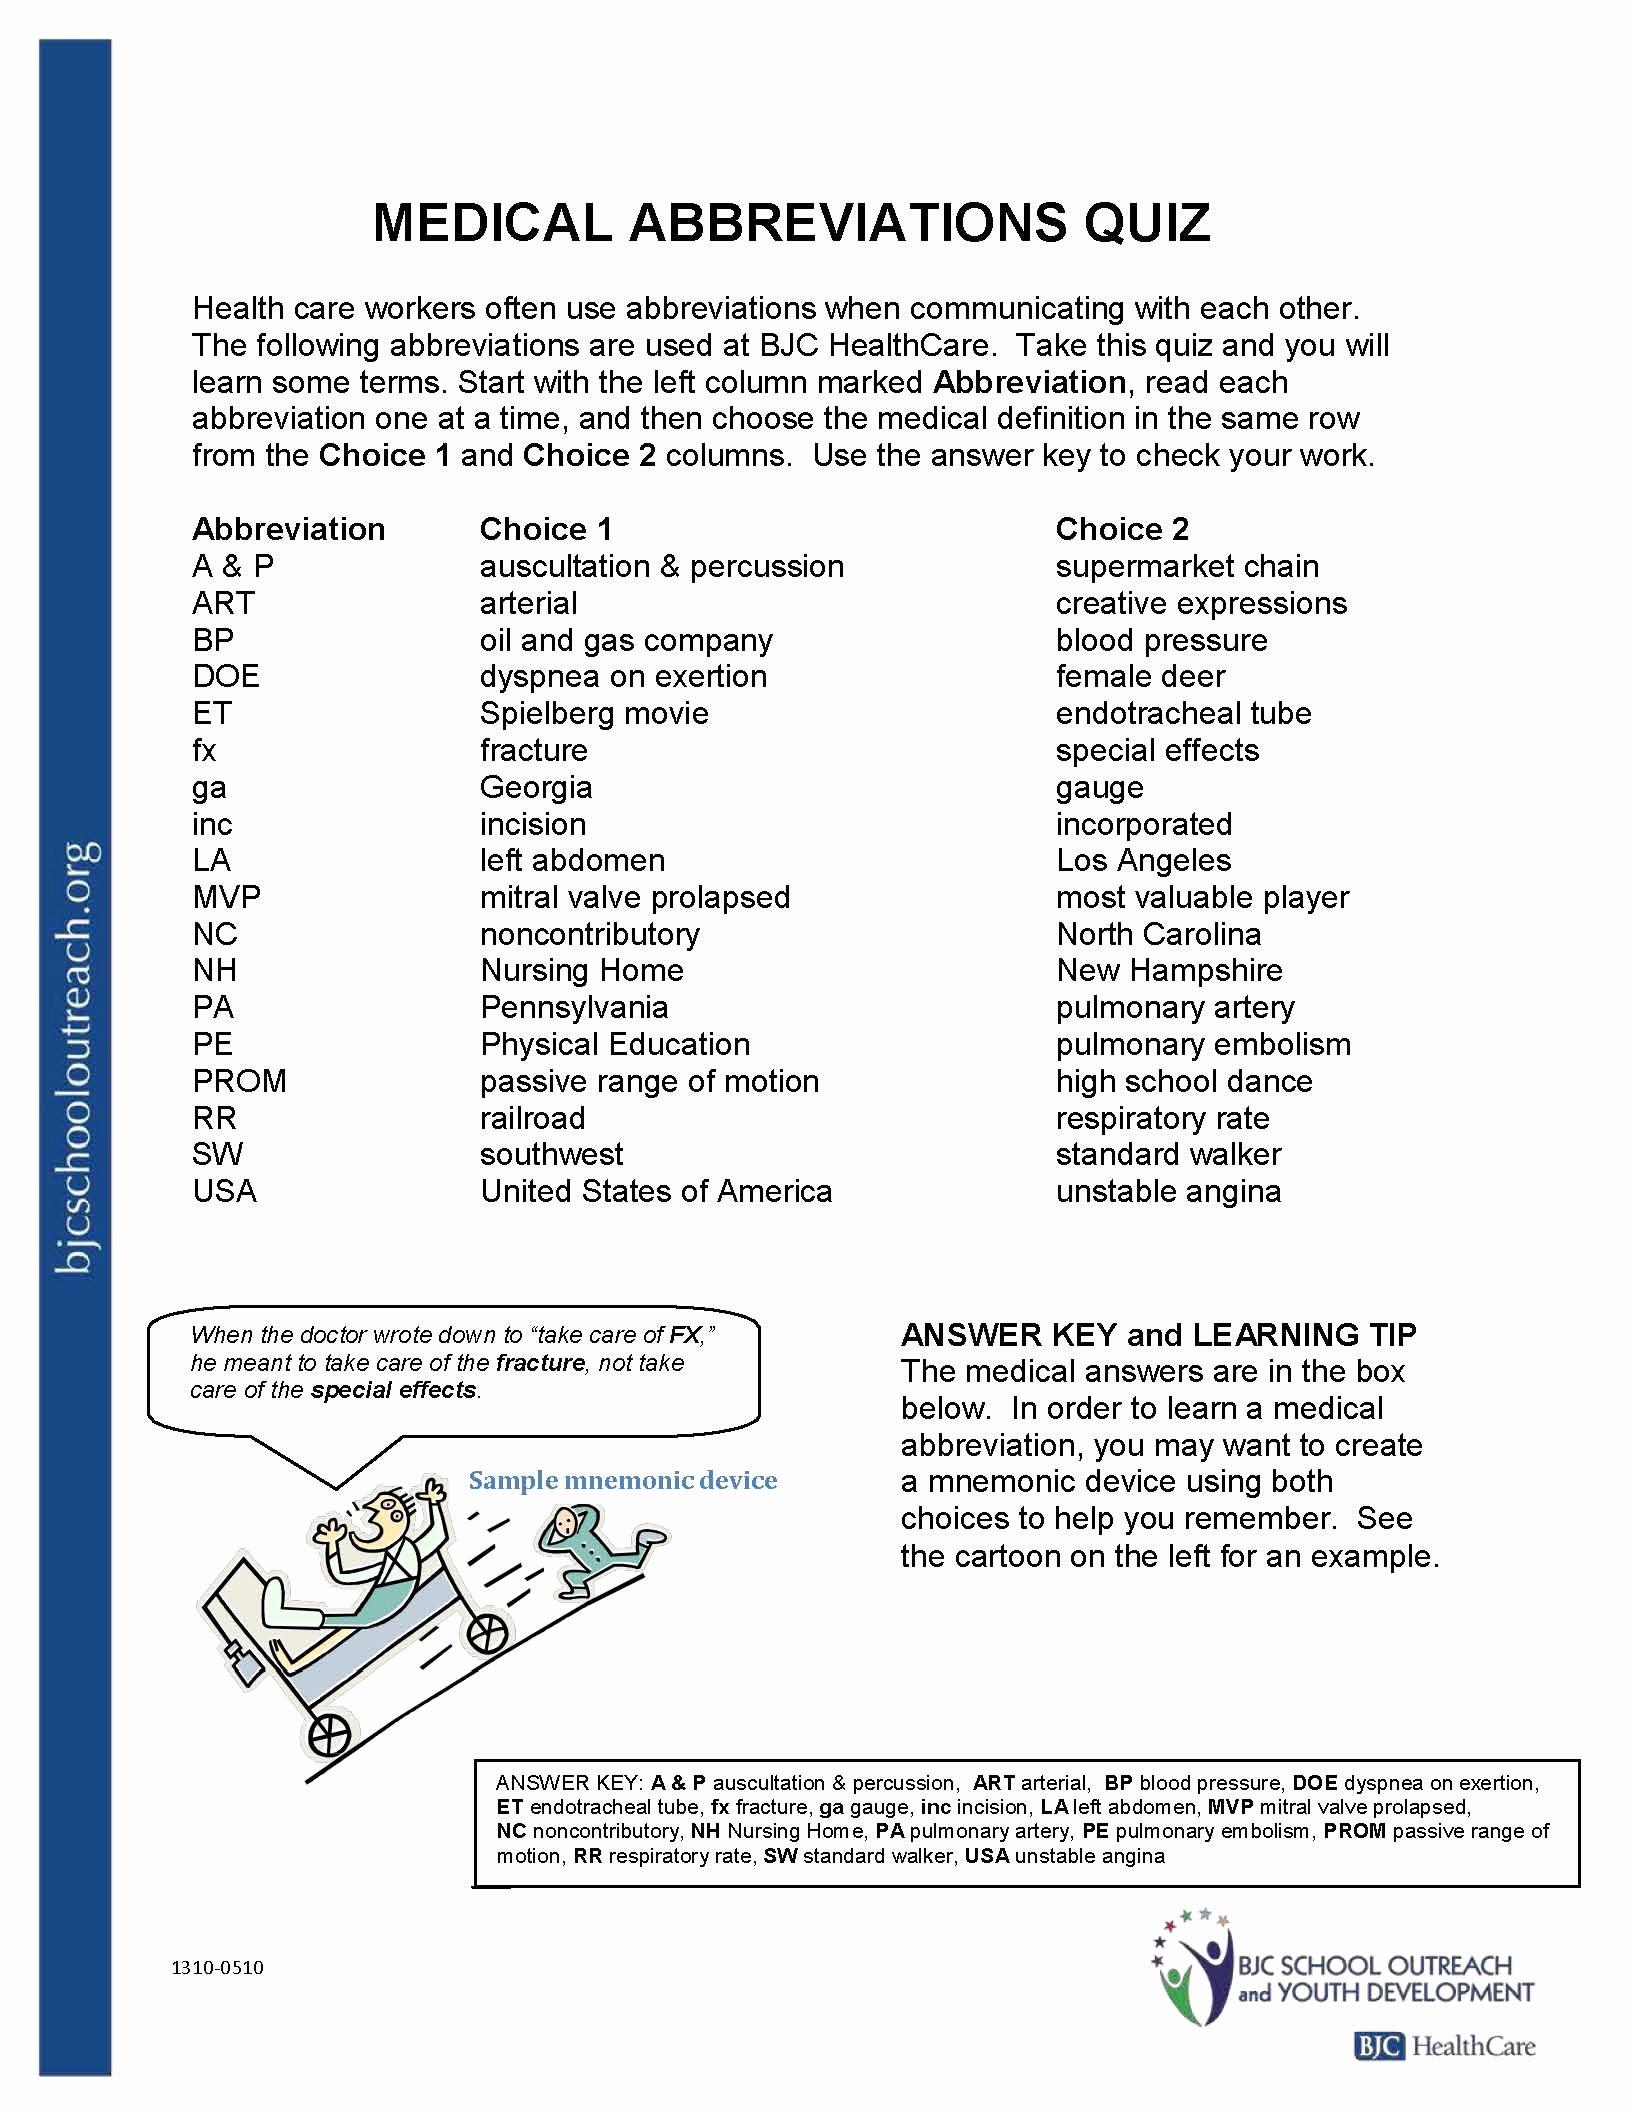 50 Medical Terminology Abbreviations Worksheet